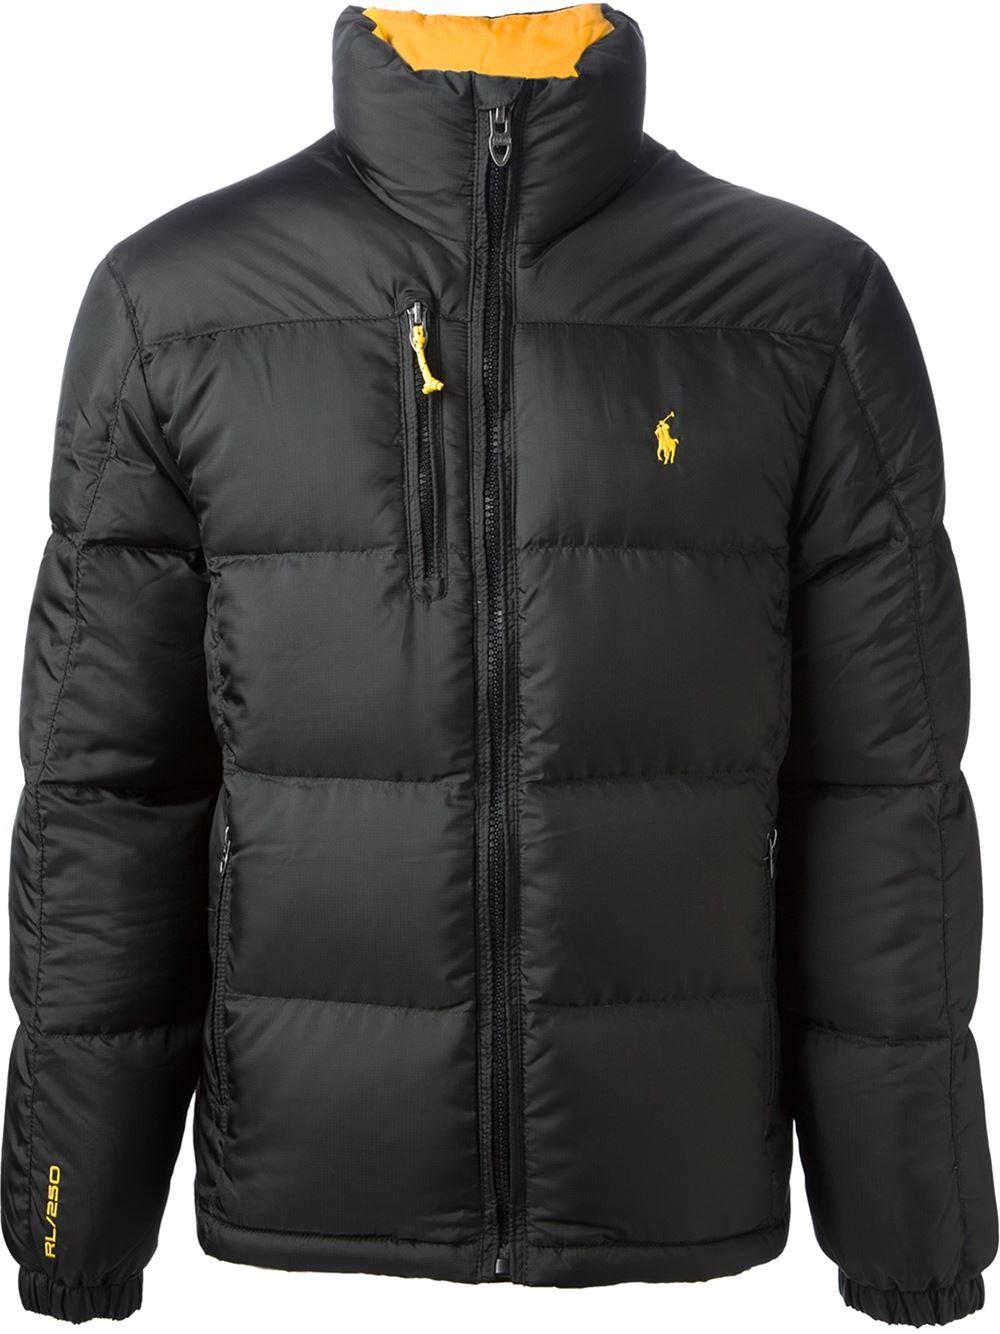 North Face Mens Fleece Jacket